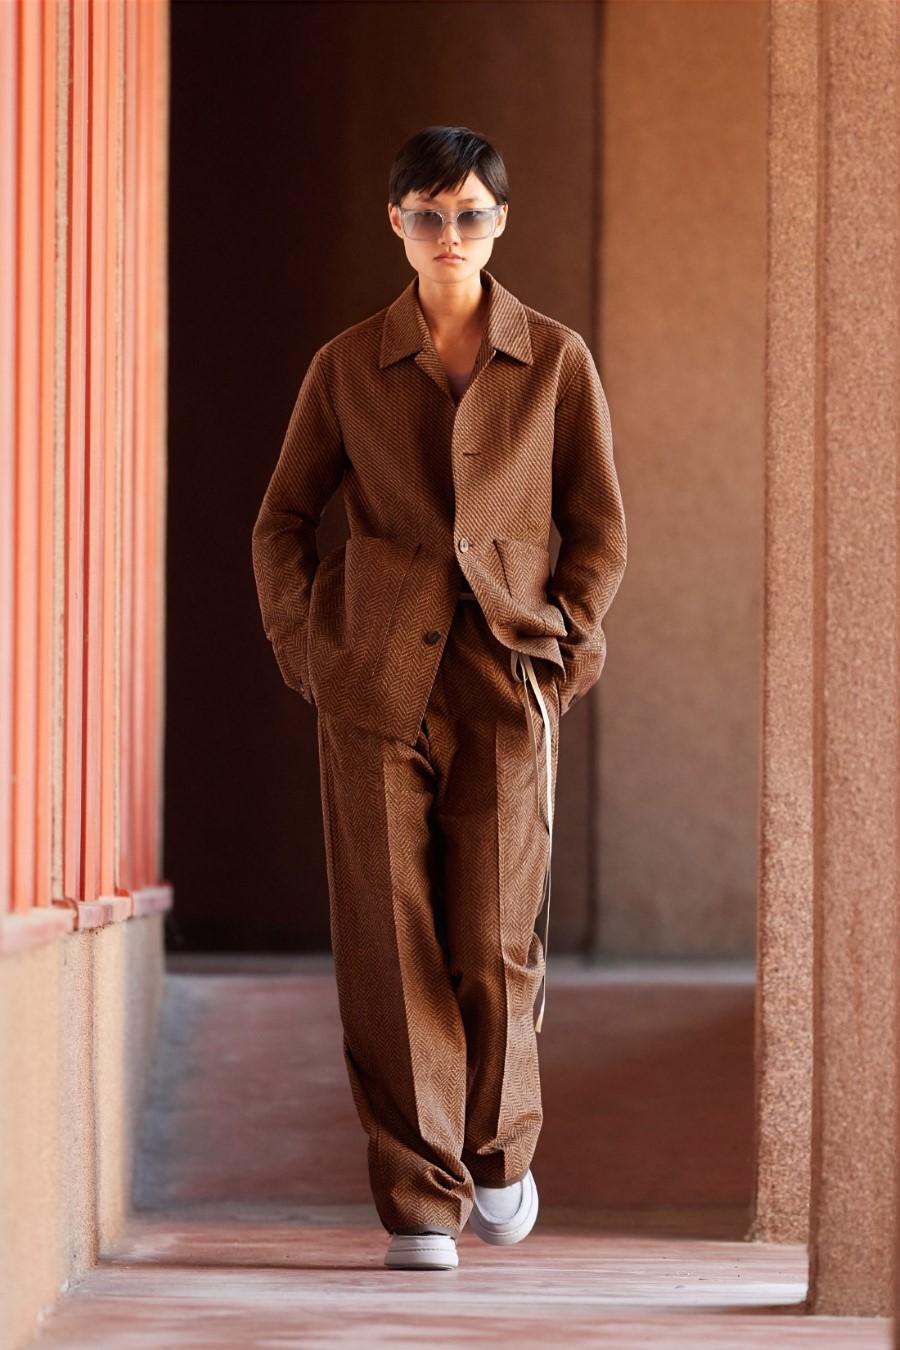 Ermenegildo Zegna Spring Summer 2022 - Milan Fashion Week Men's